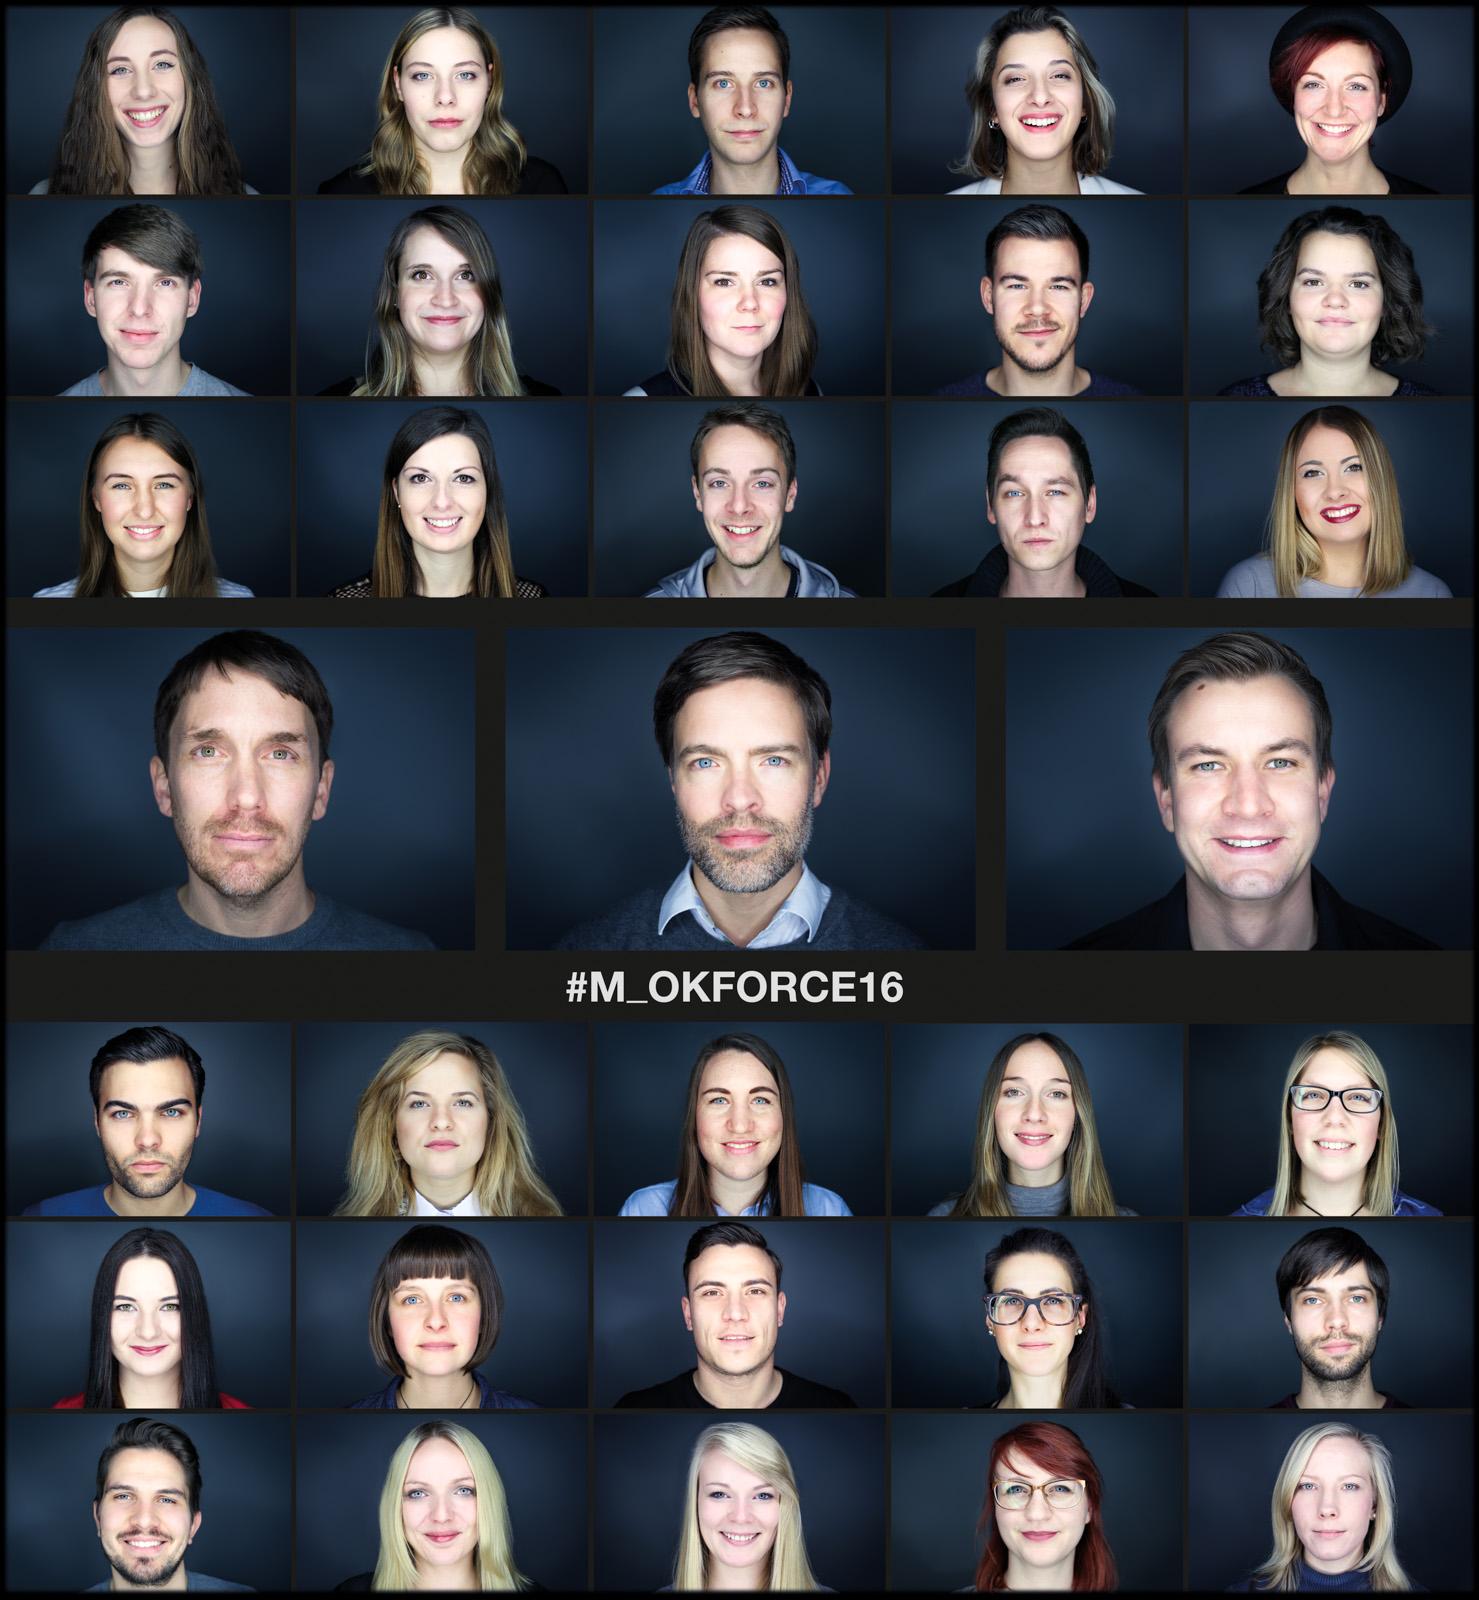 Headshot Image of all Master Online Communication Students